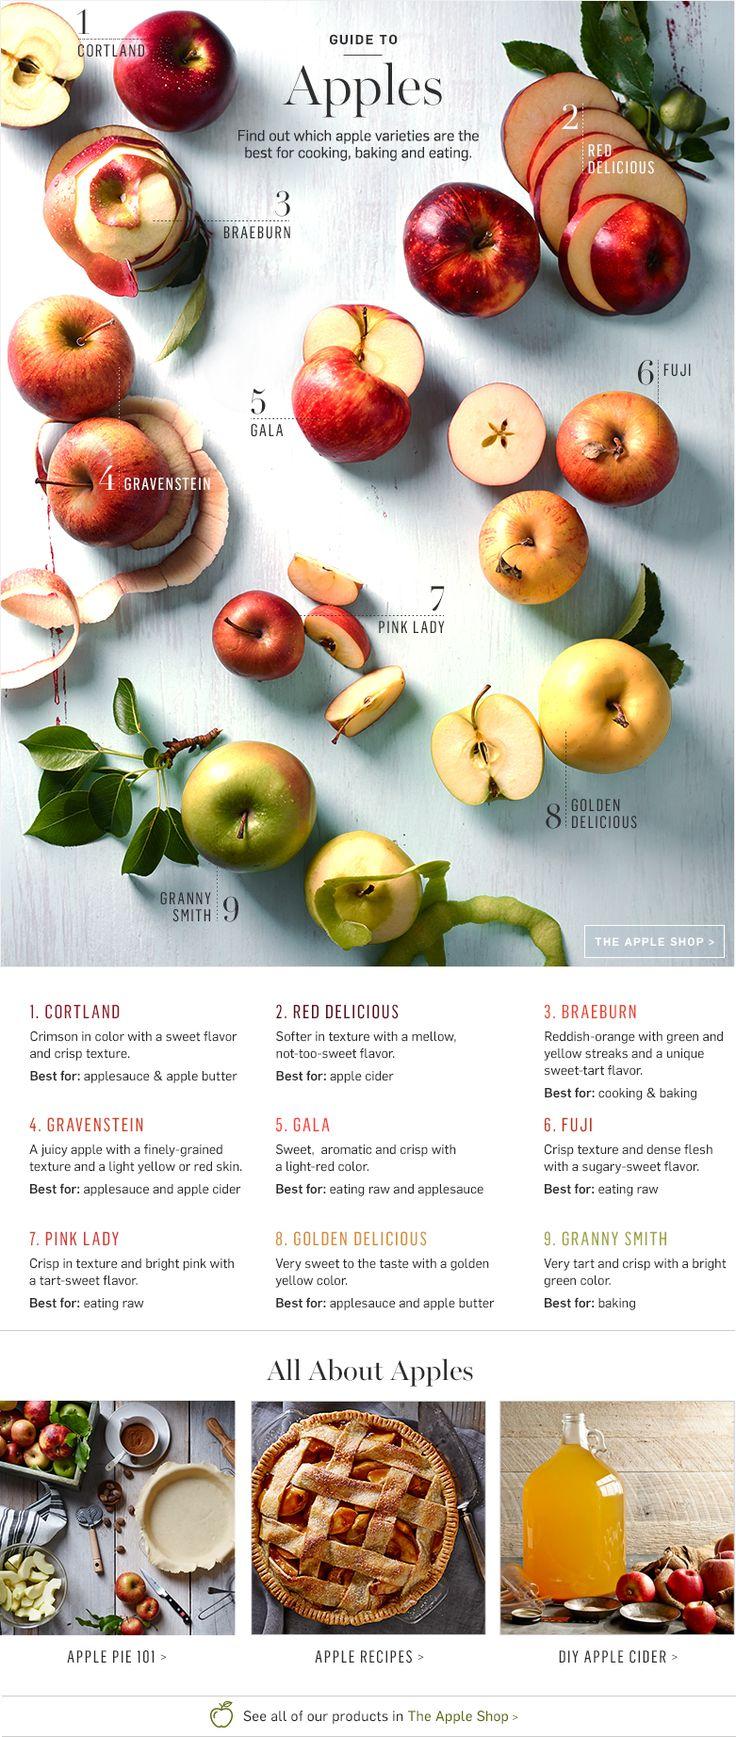 Apple varities